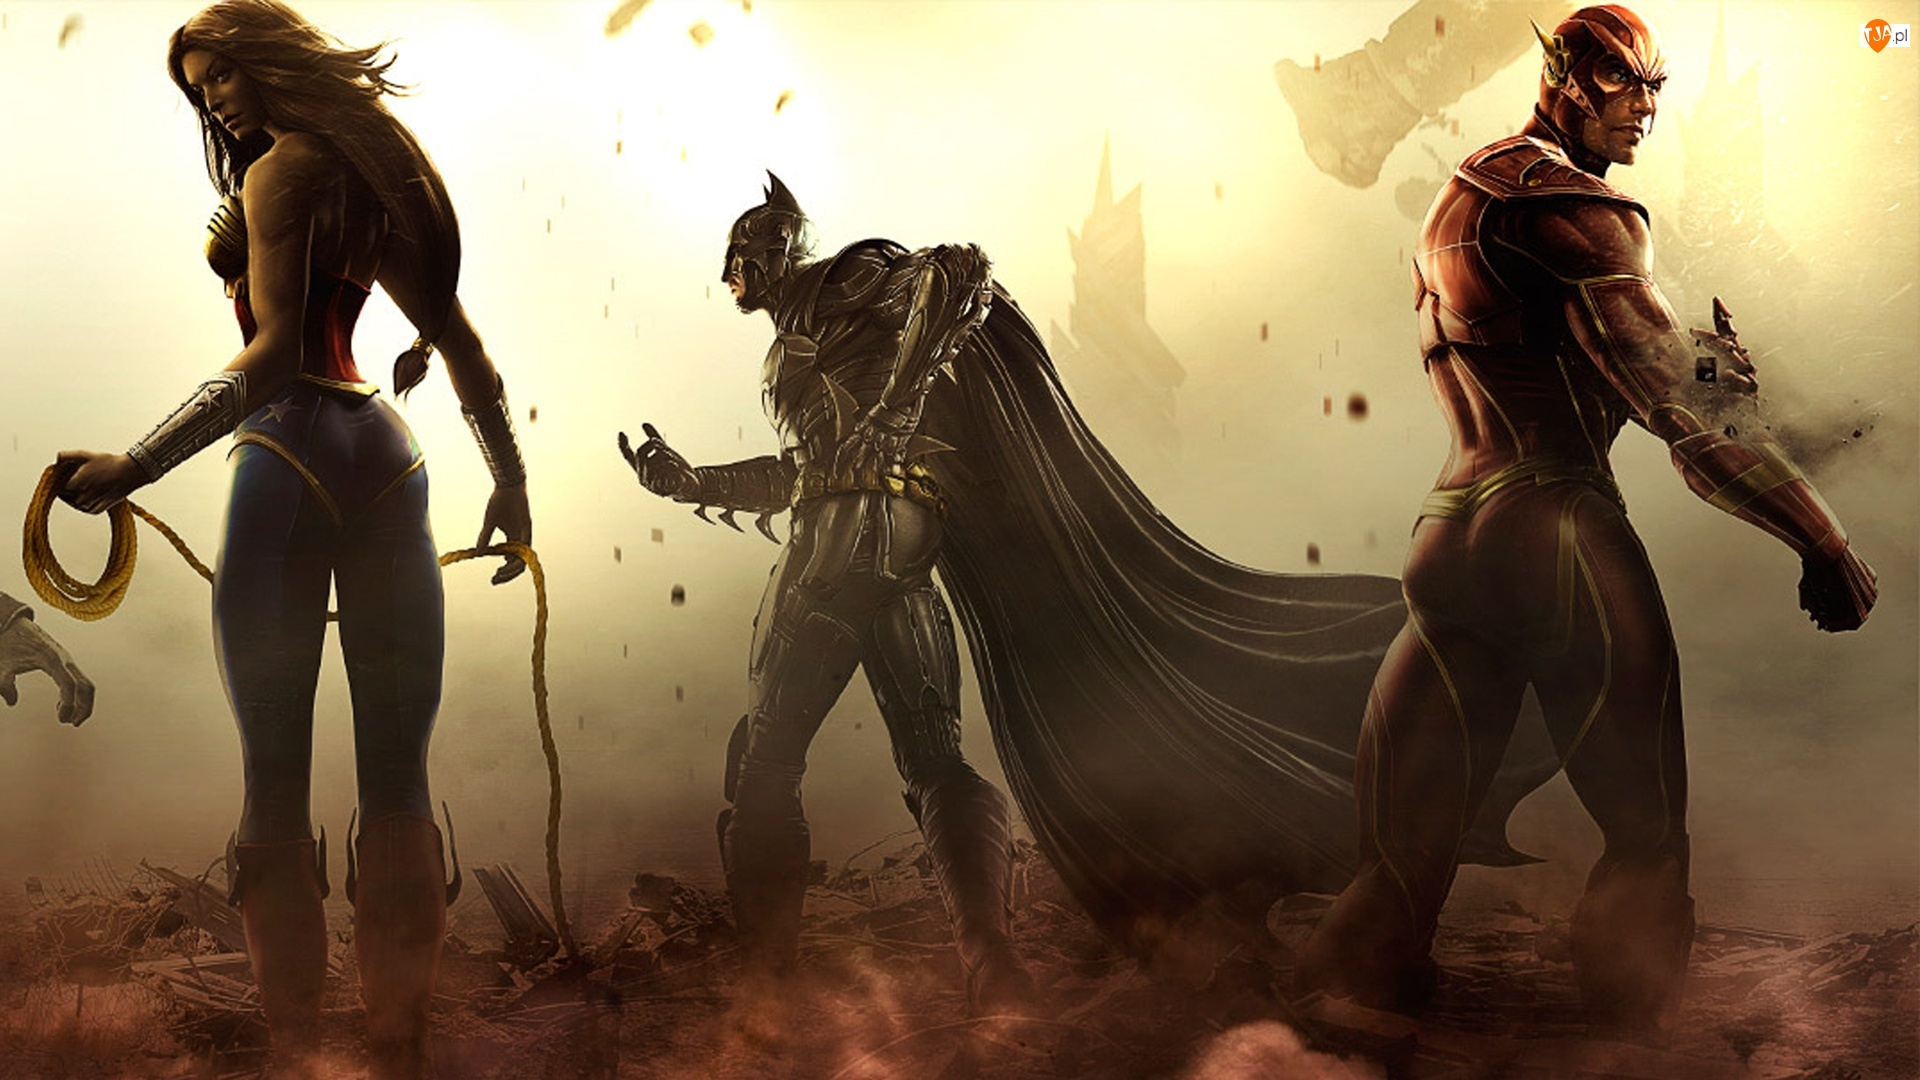 Injustice Gods Among Us, Flash, Wonder Woman, Batman